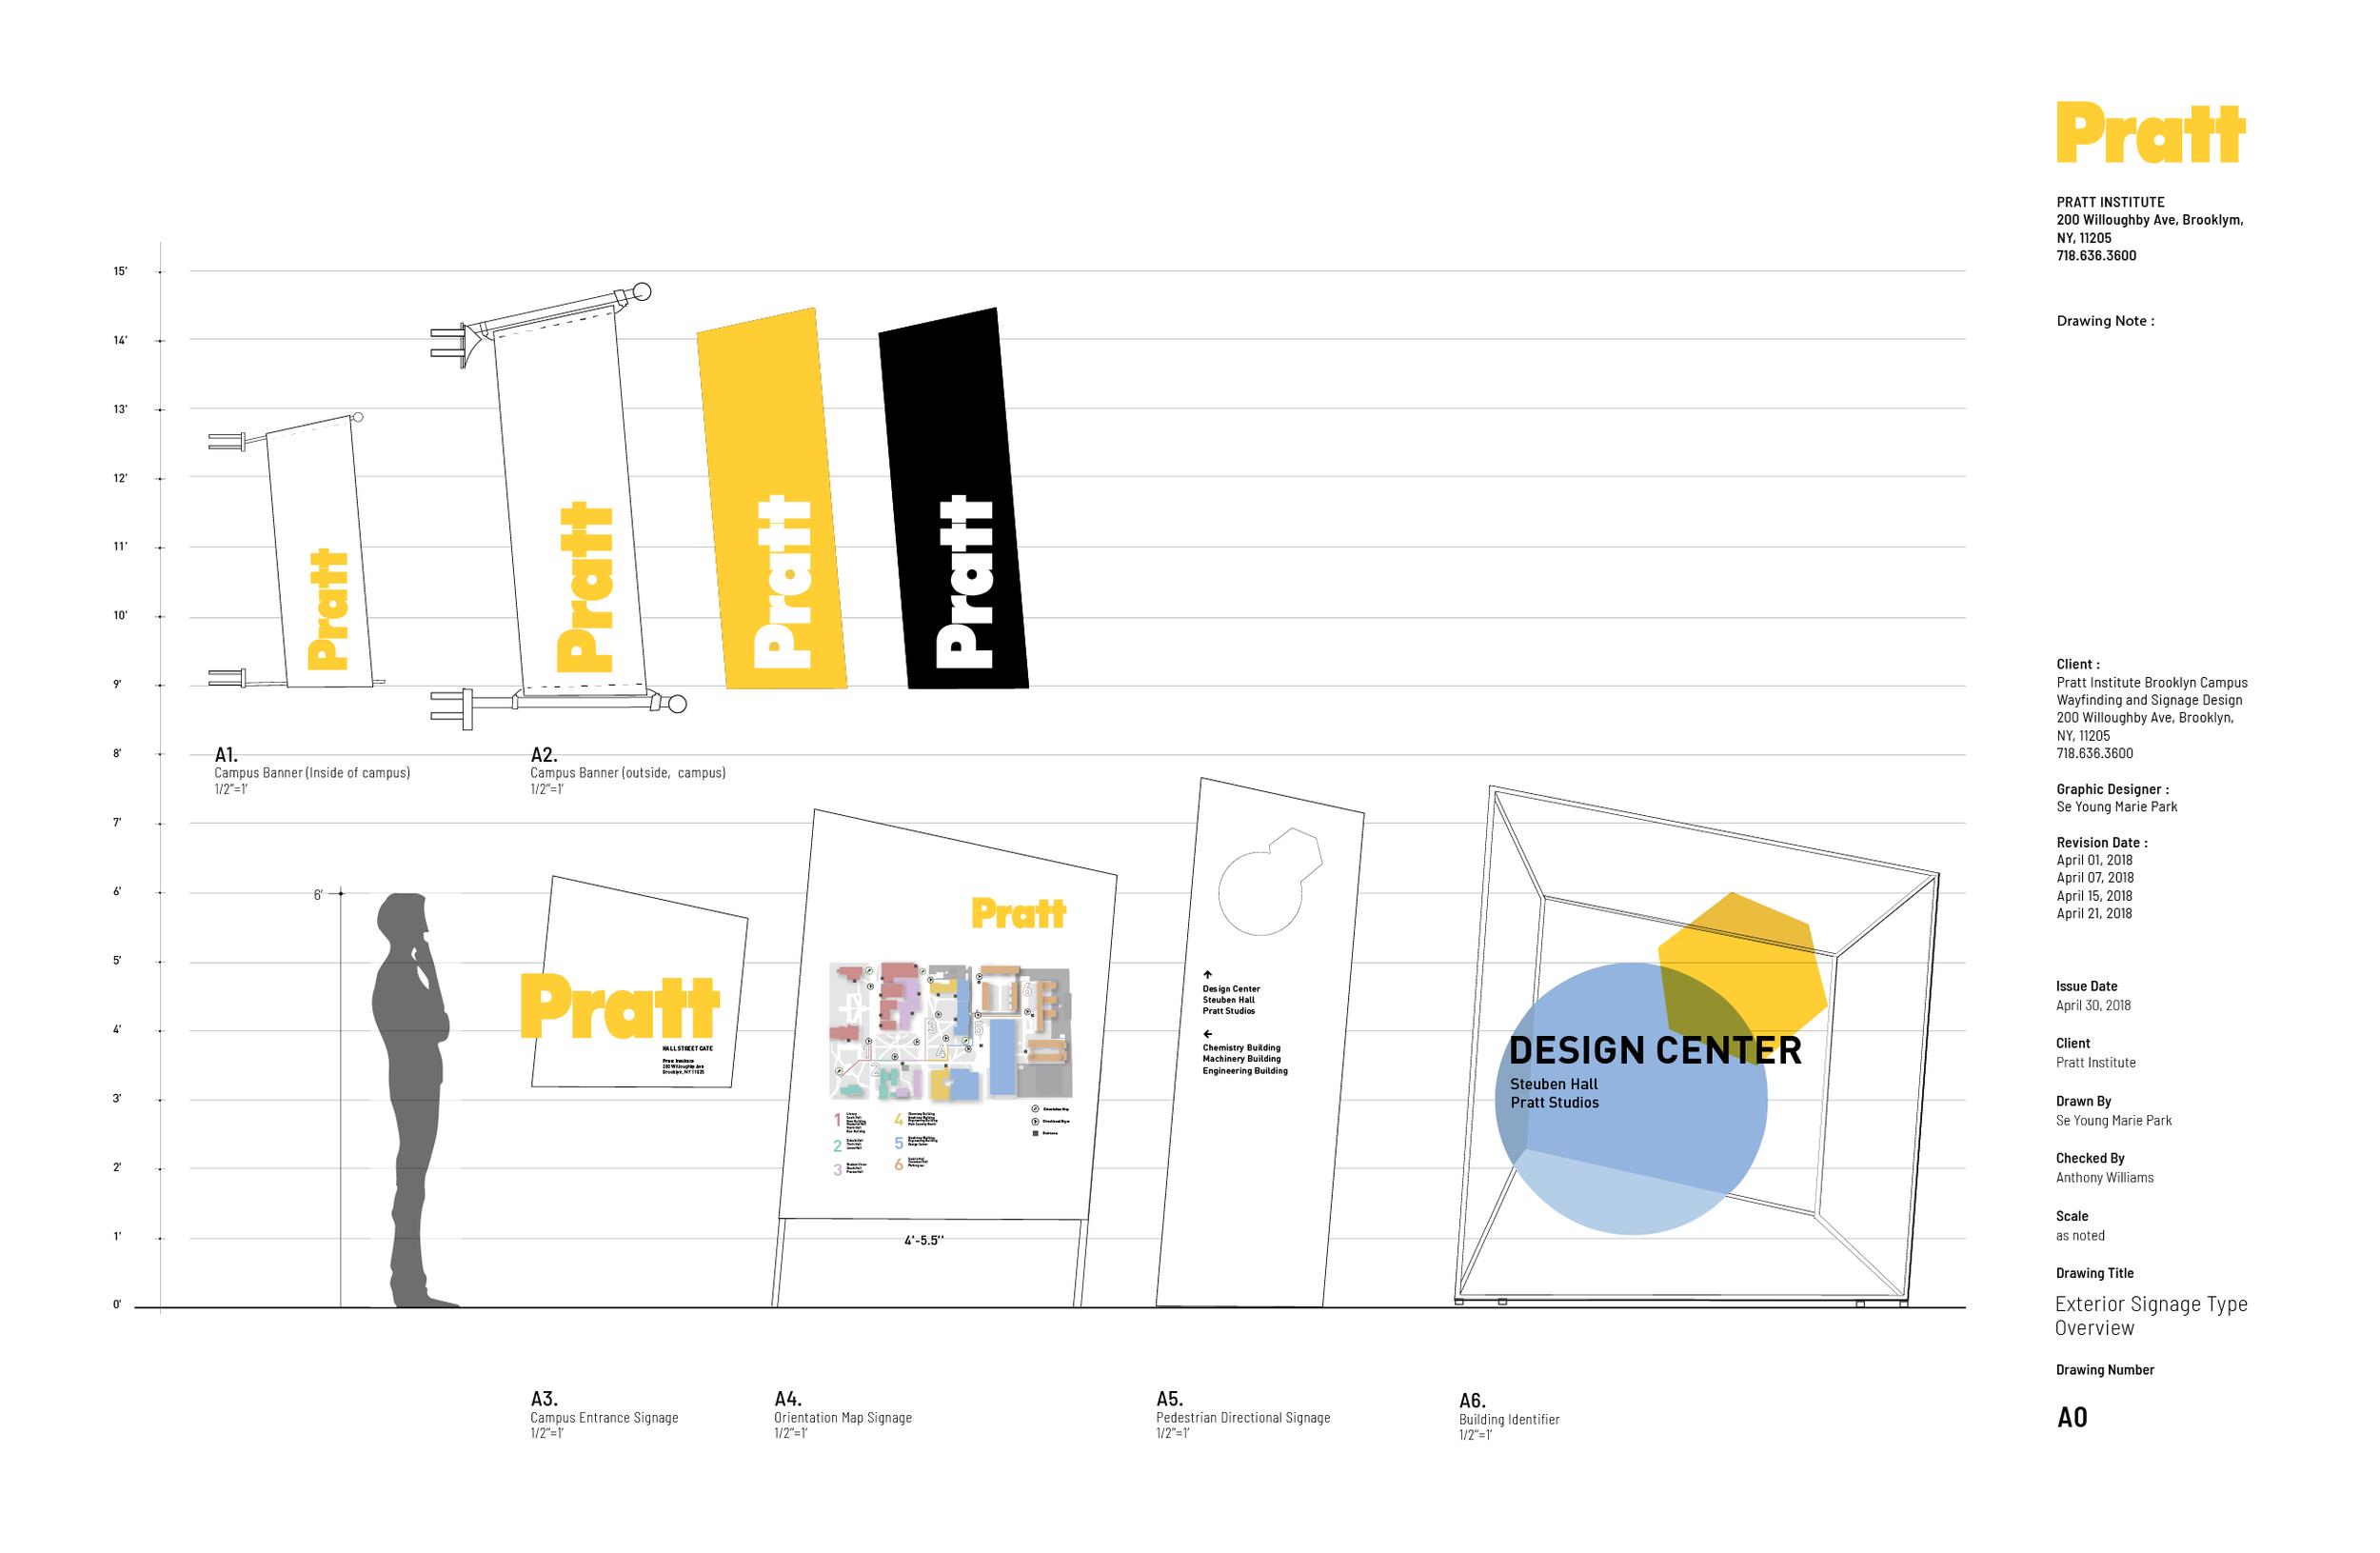 Pratt_Wayfinding_Signage_Design-01.png